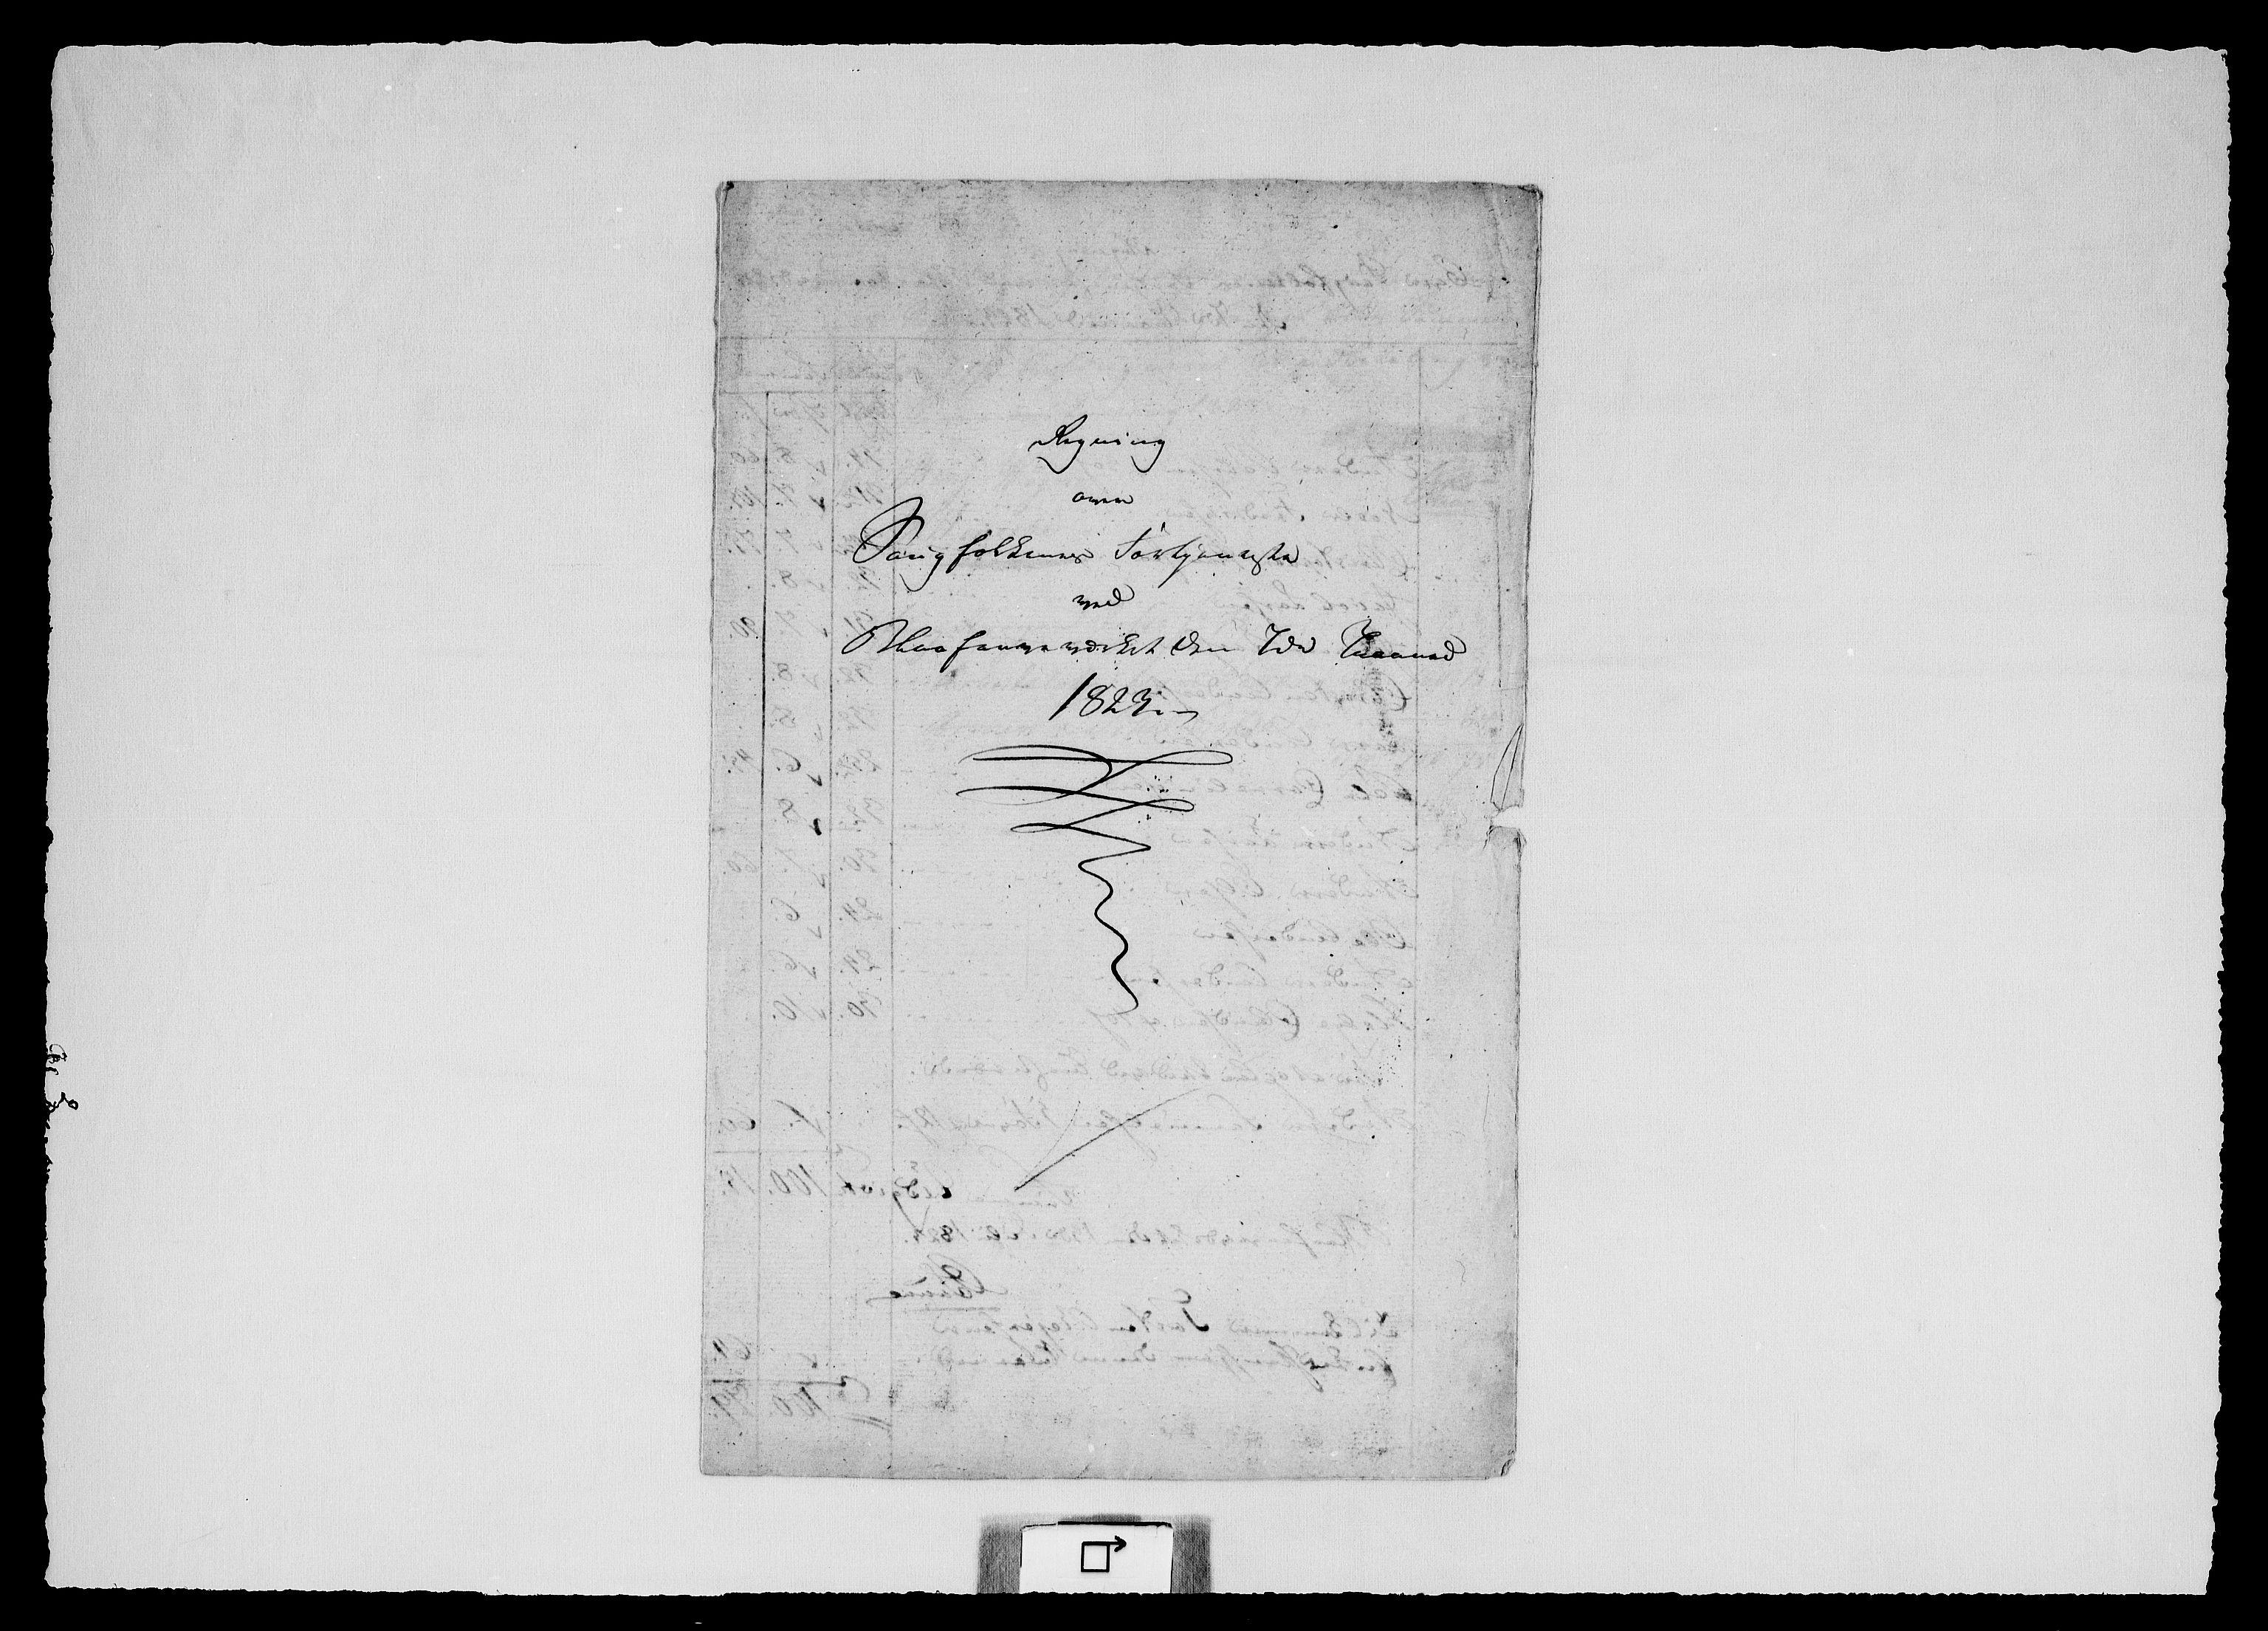 RA, Modums Blaafarveværk, G/Gd/Gdd/L0308, 1823-1827, s. 2